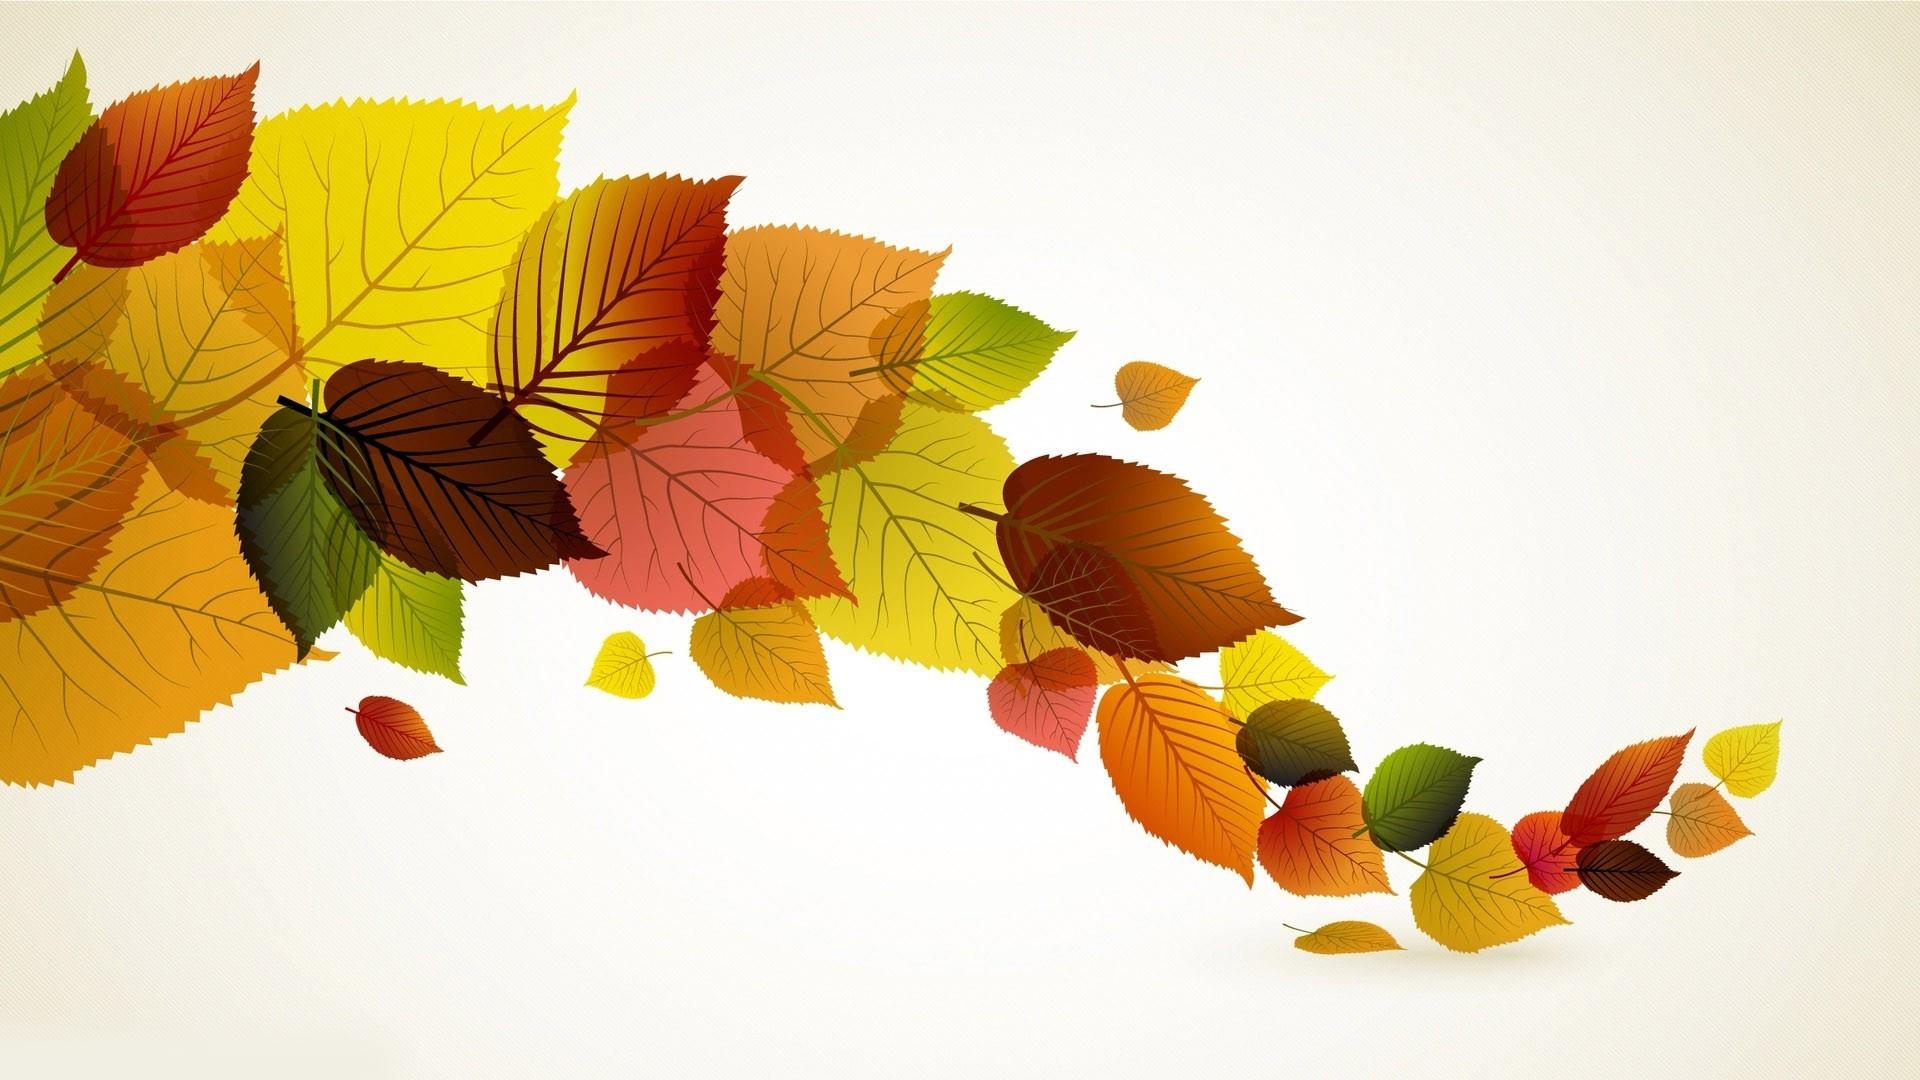 Autumn leaves wallpaper   661443 1920x1080